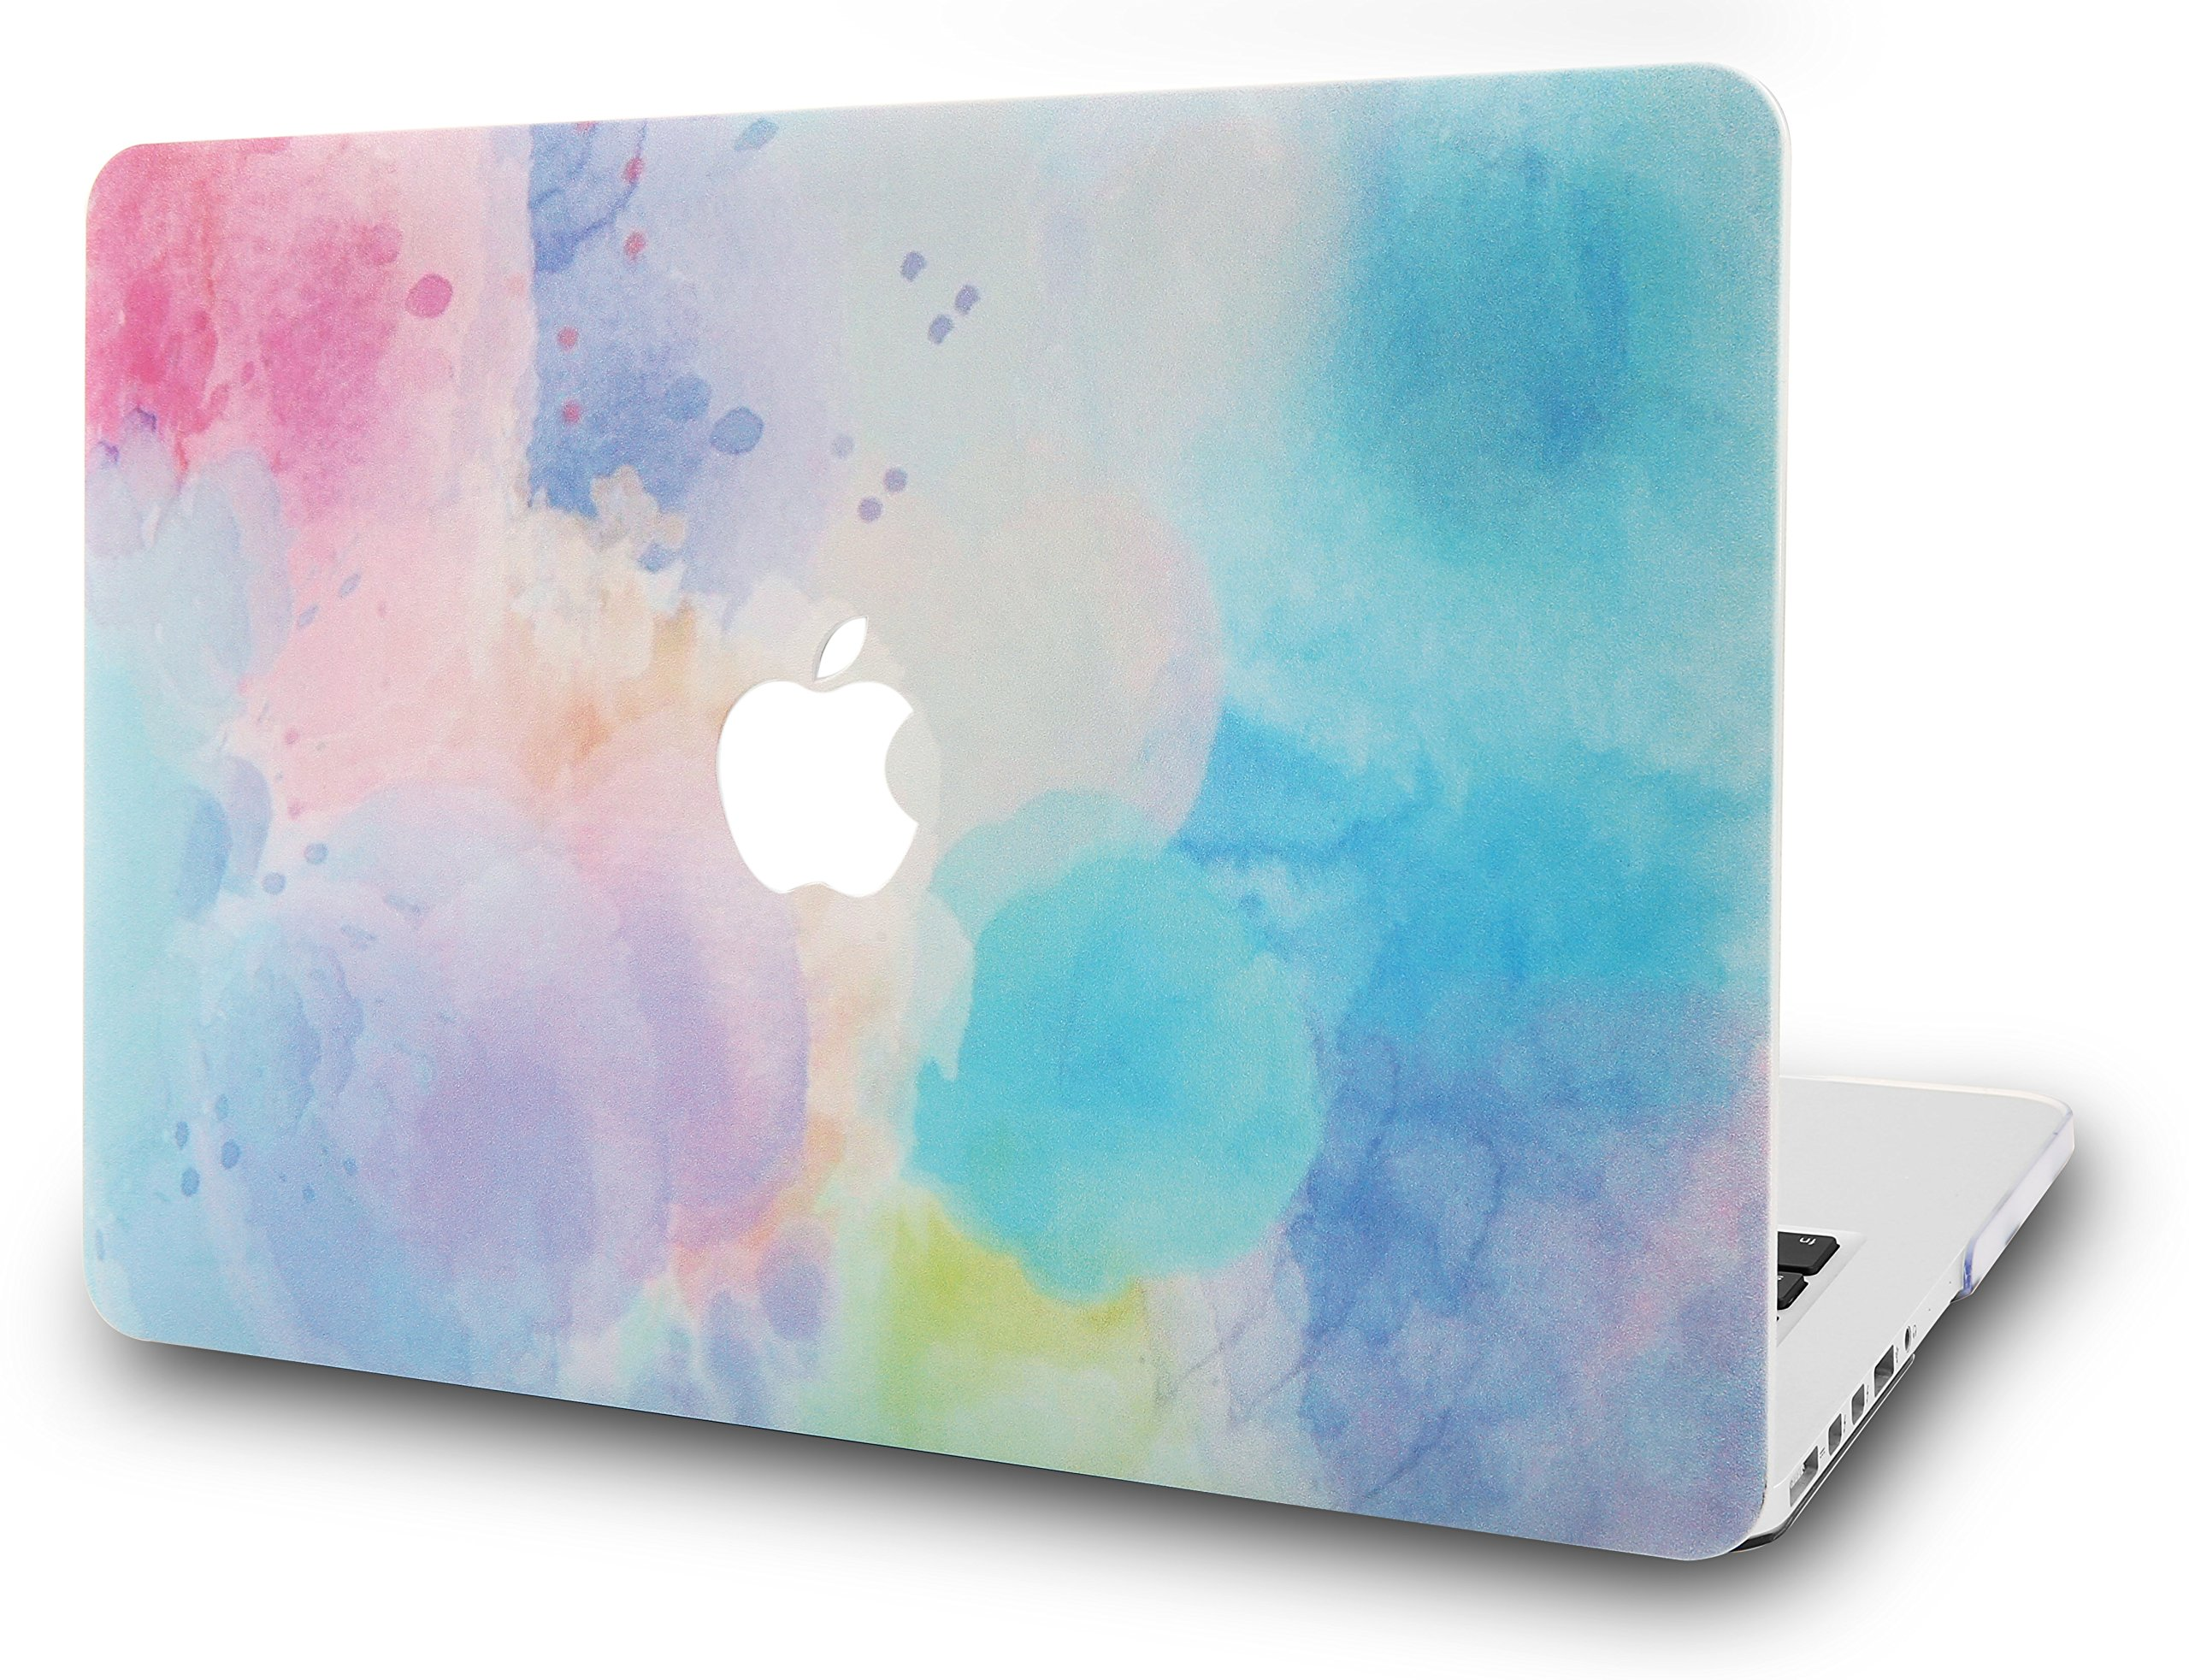 "KECC Laptop Case for MacBook 12"" Plastic Case Hard Shell Cover A1534 (Rainbow Mist 2)"